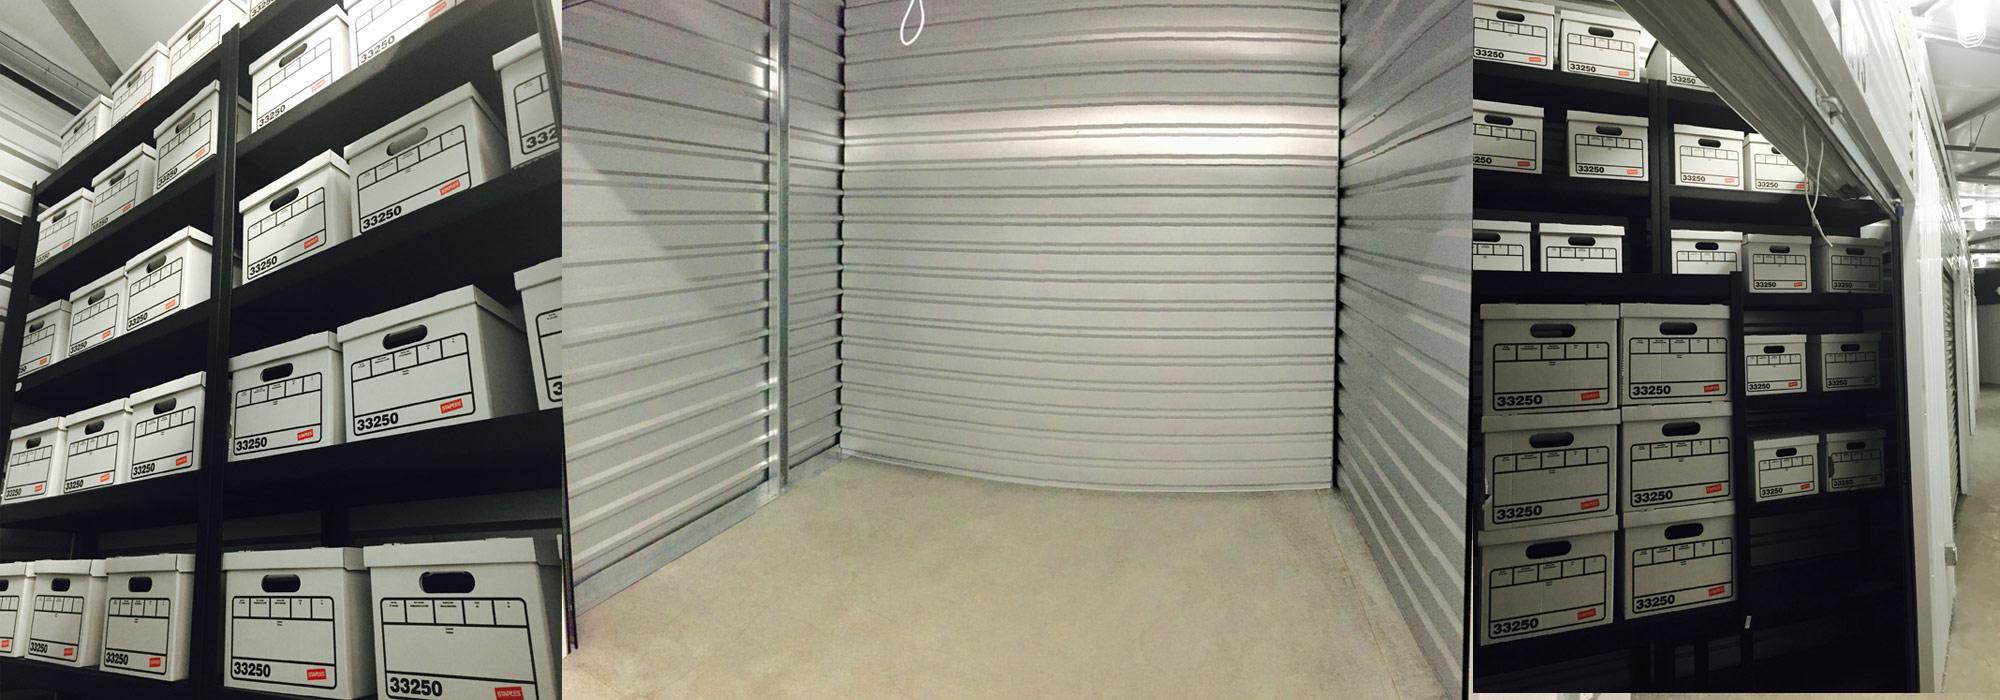 Mini Self Storage – view #03